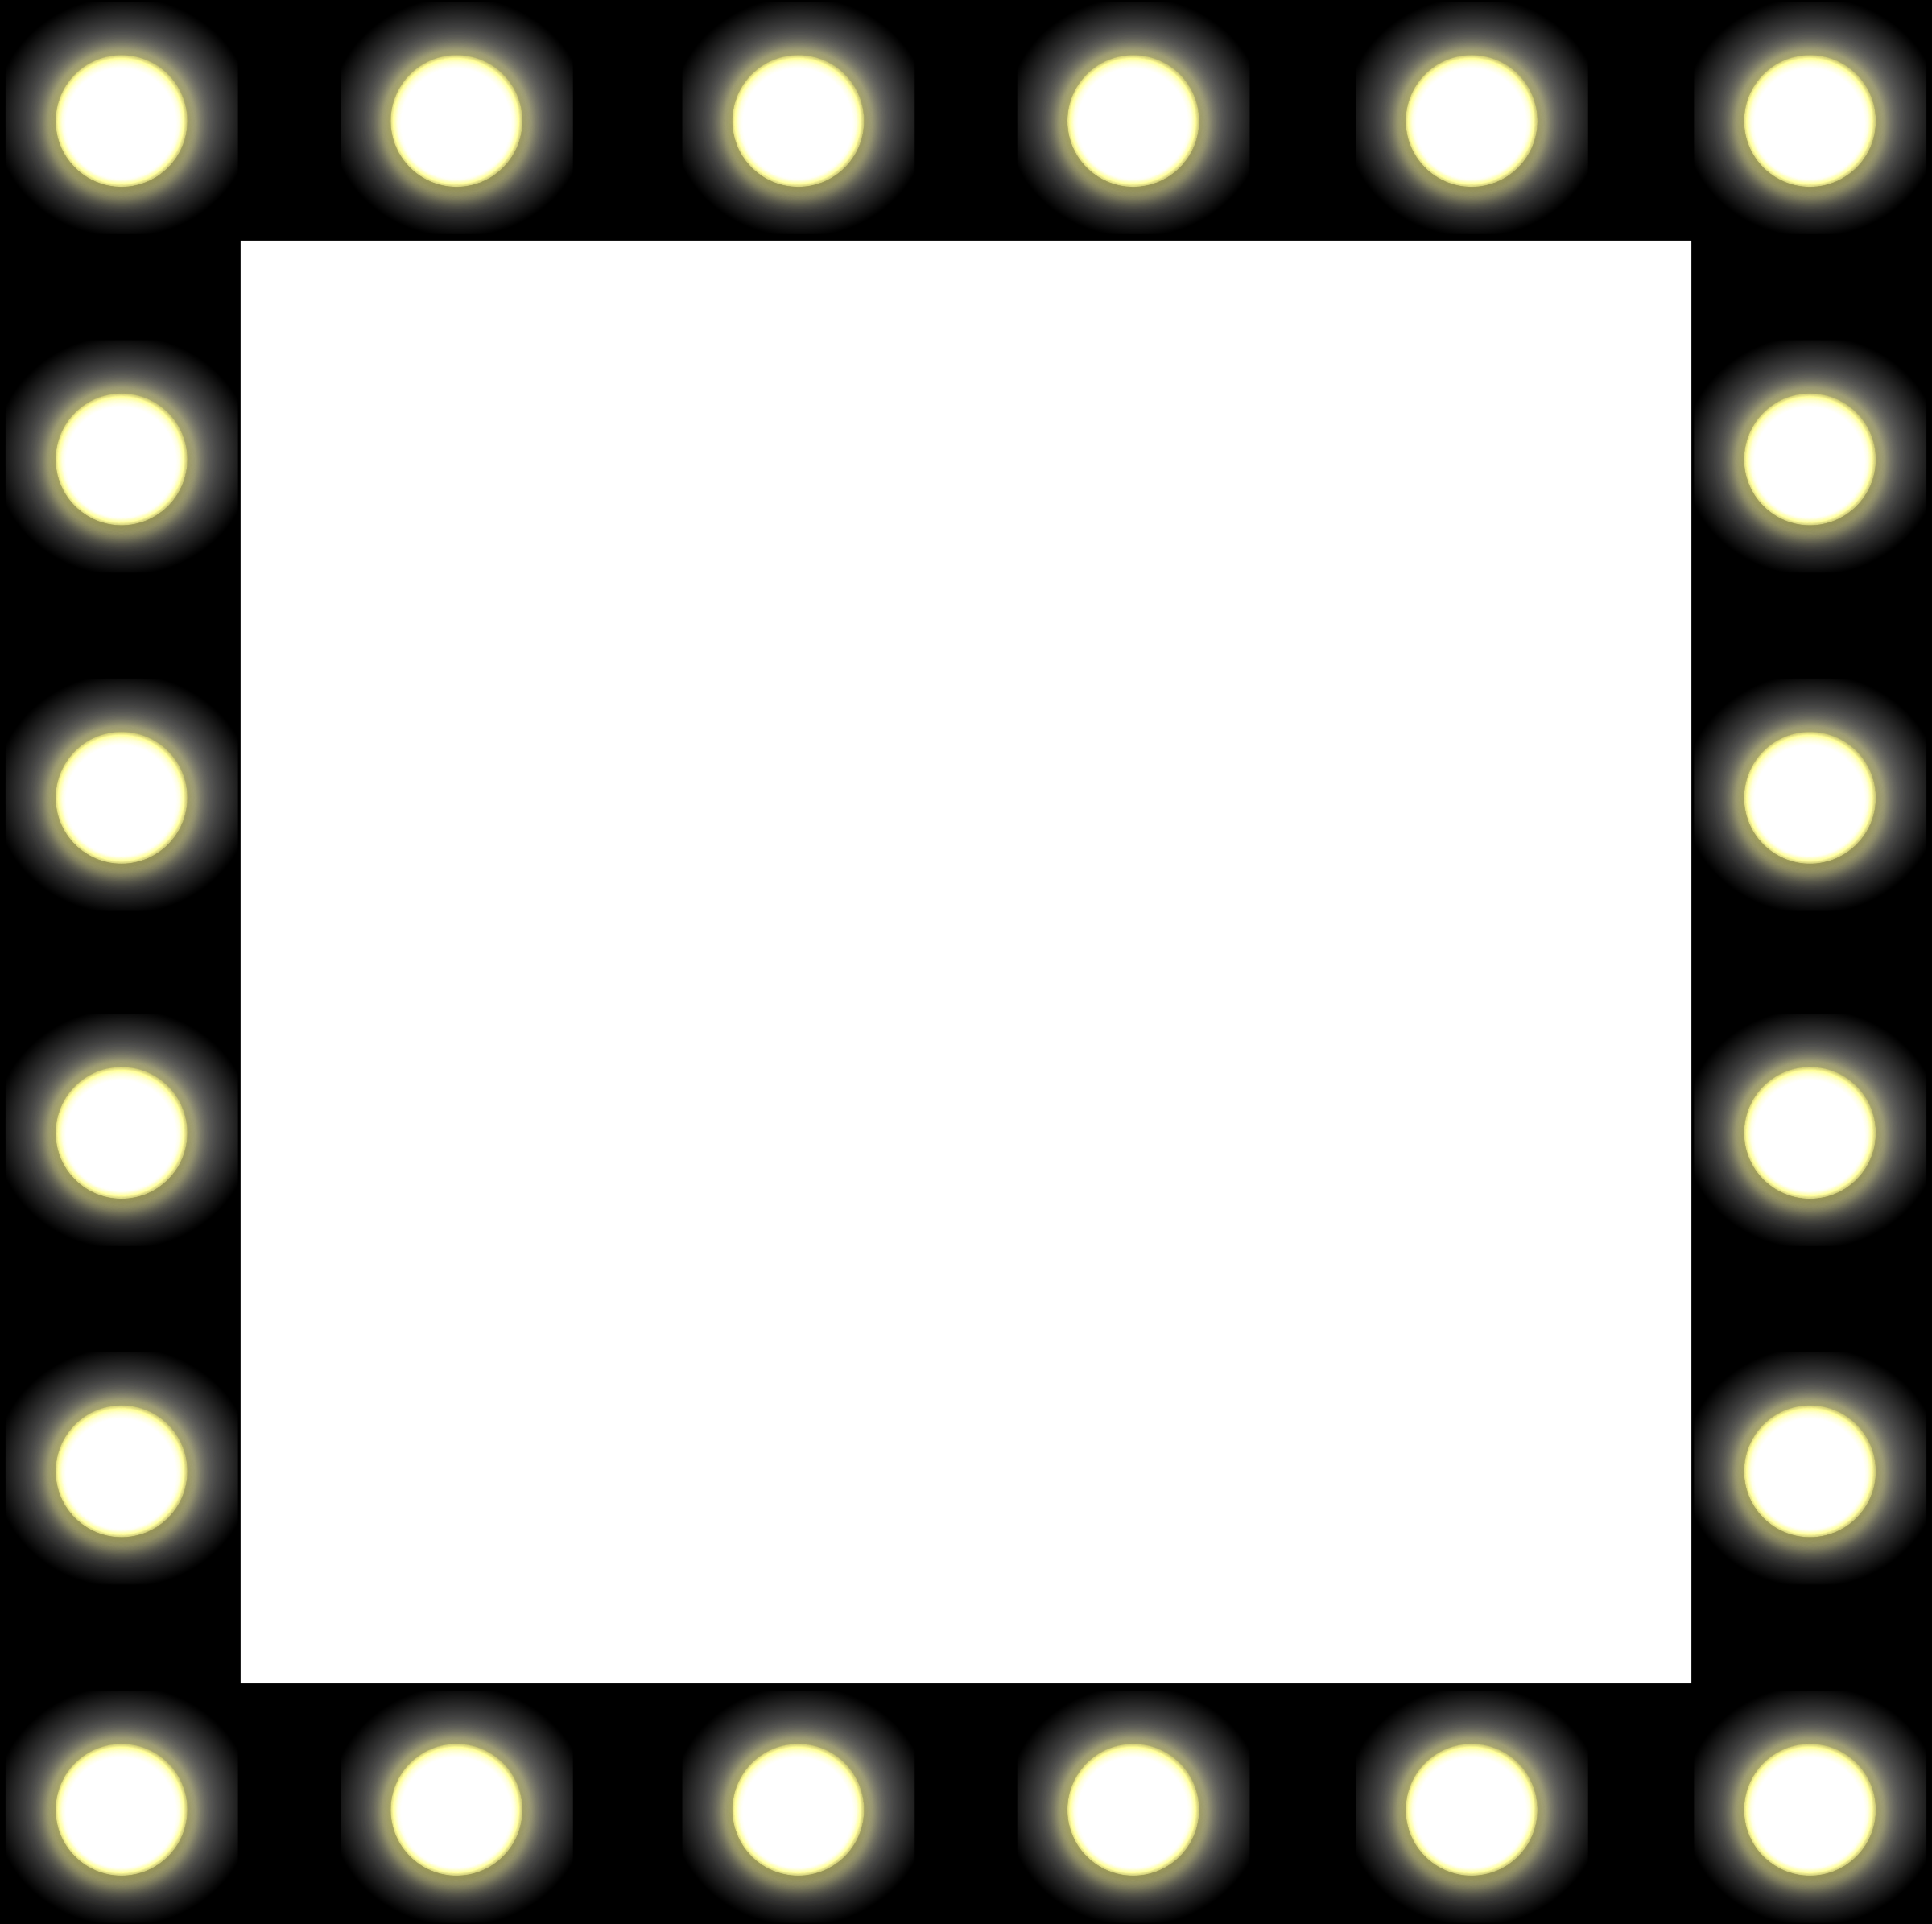 Mirror clipart rectangle mirror. Light bulb border free